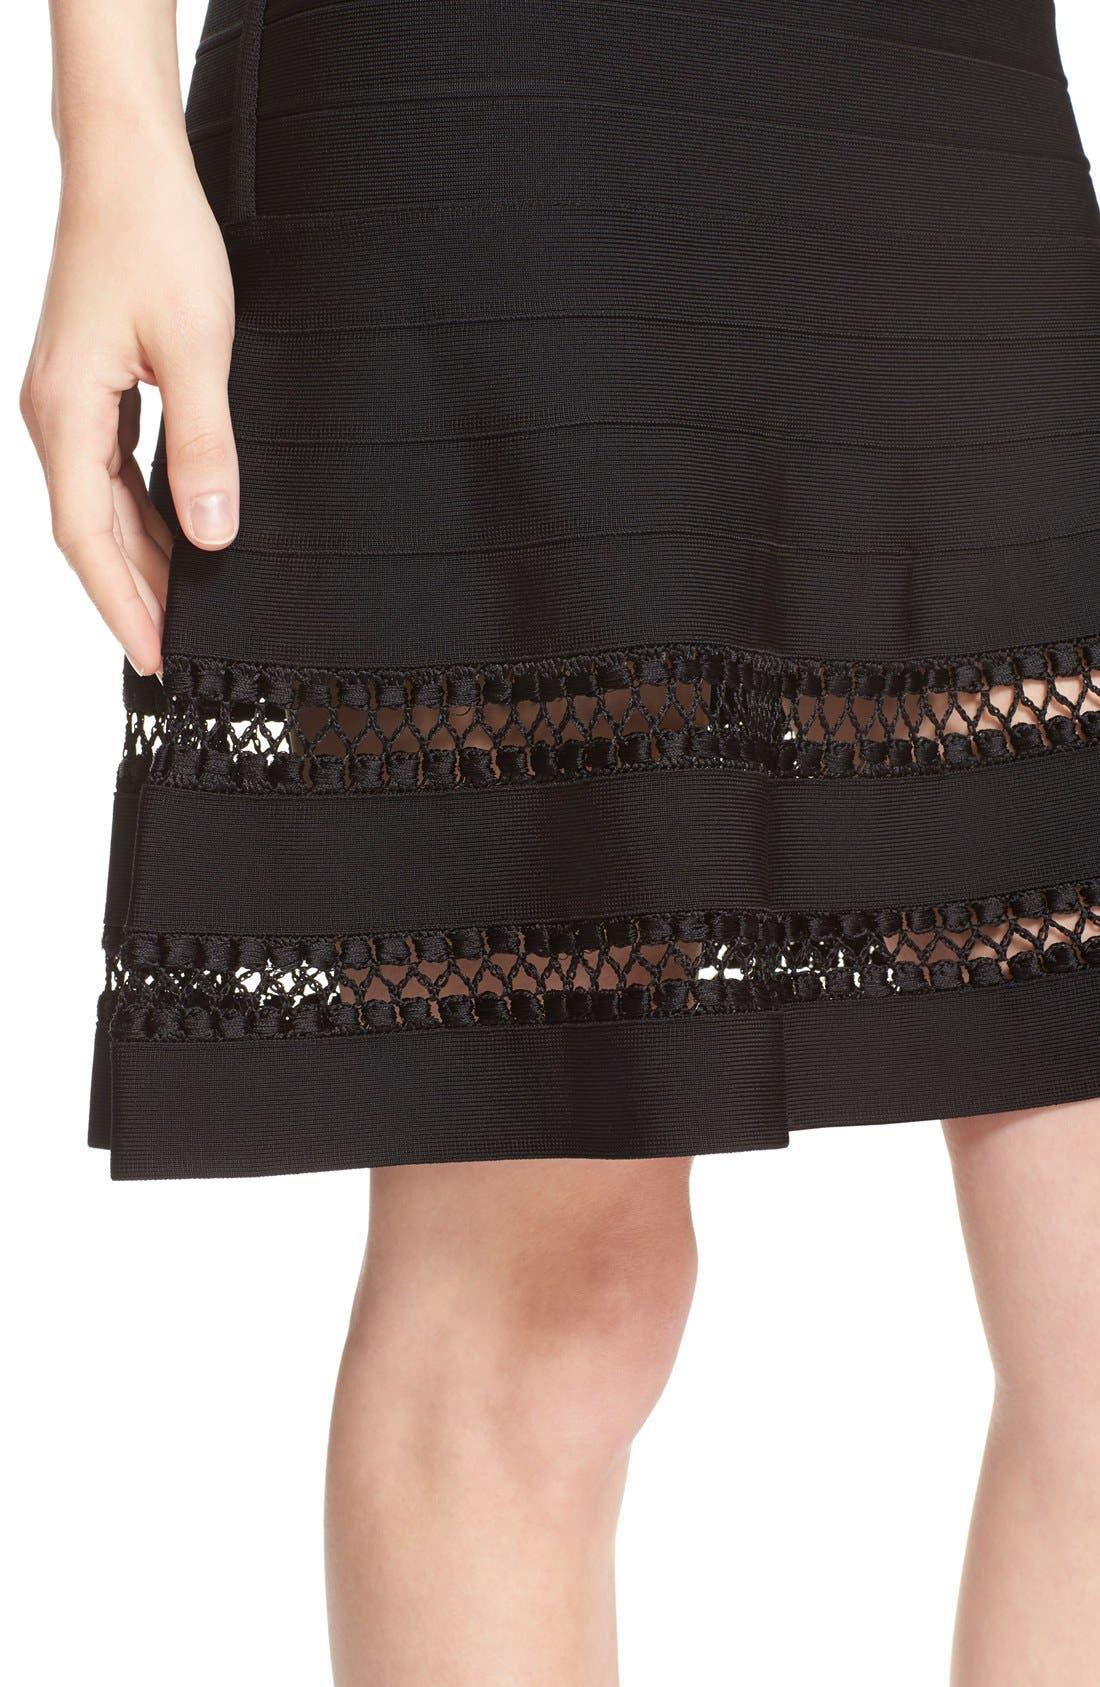 Alternate Image 4  - Herve Leger 'Amelie' Crochet Cage Stitch Bandage Skirt